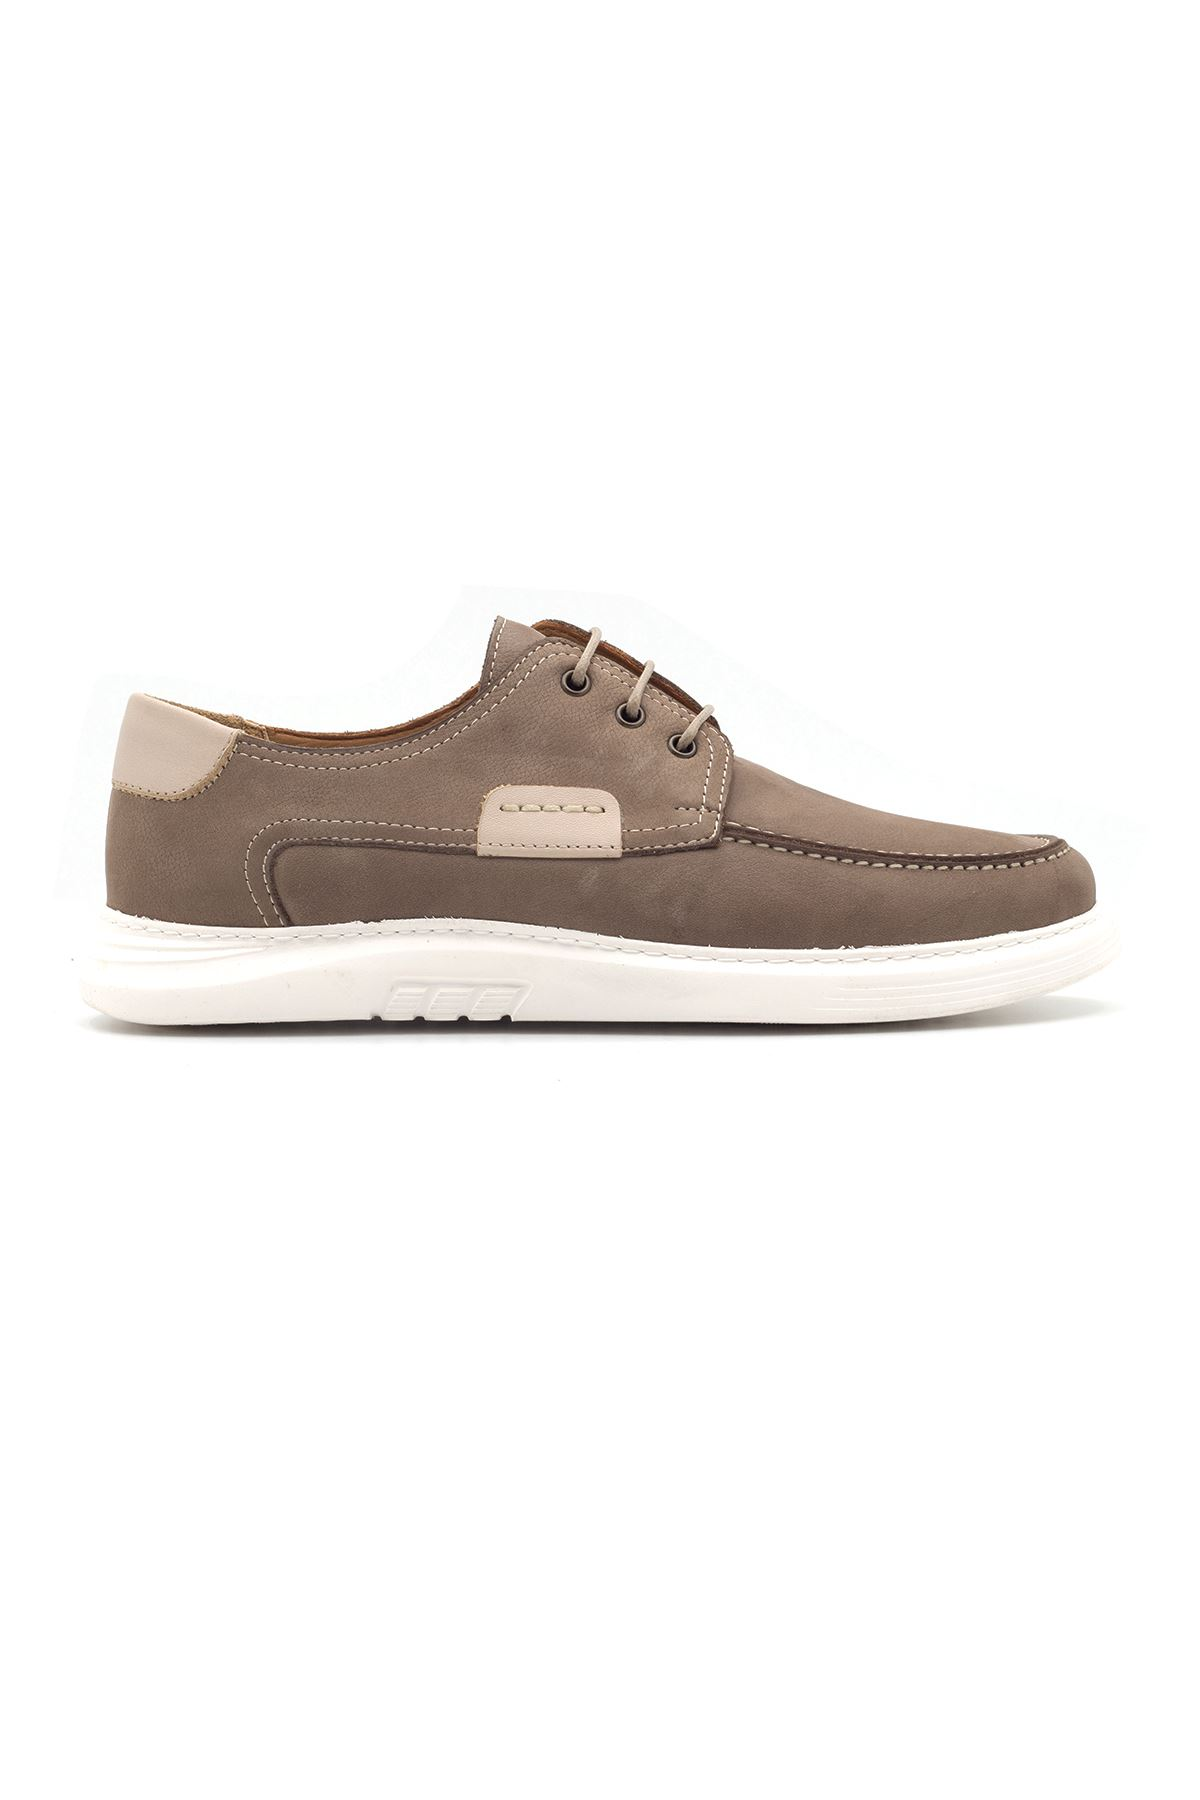 2101 Nubuk Kum Stil Erkek Ayakkabı